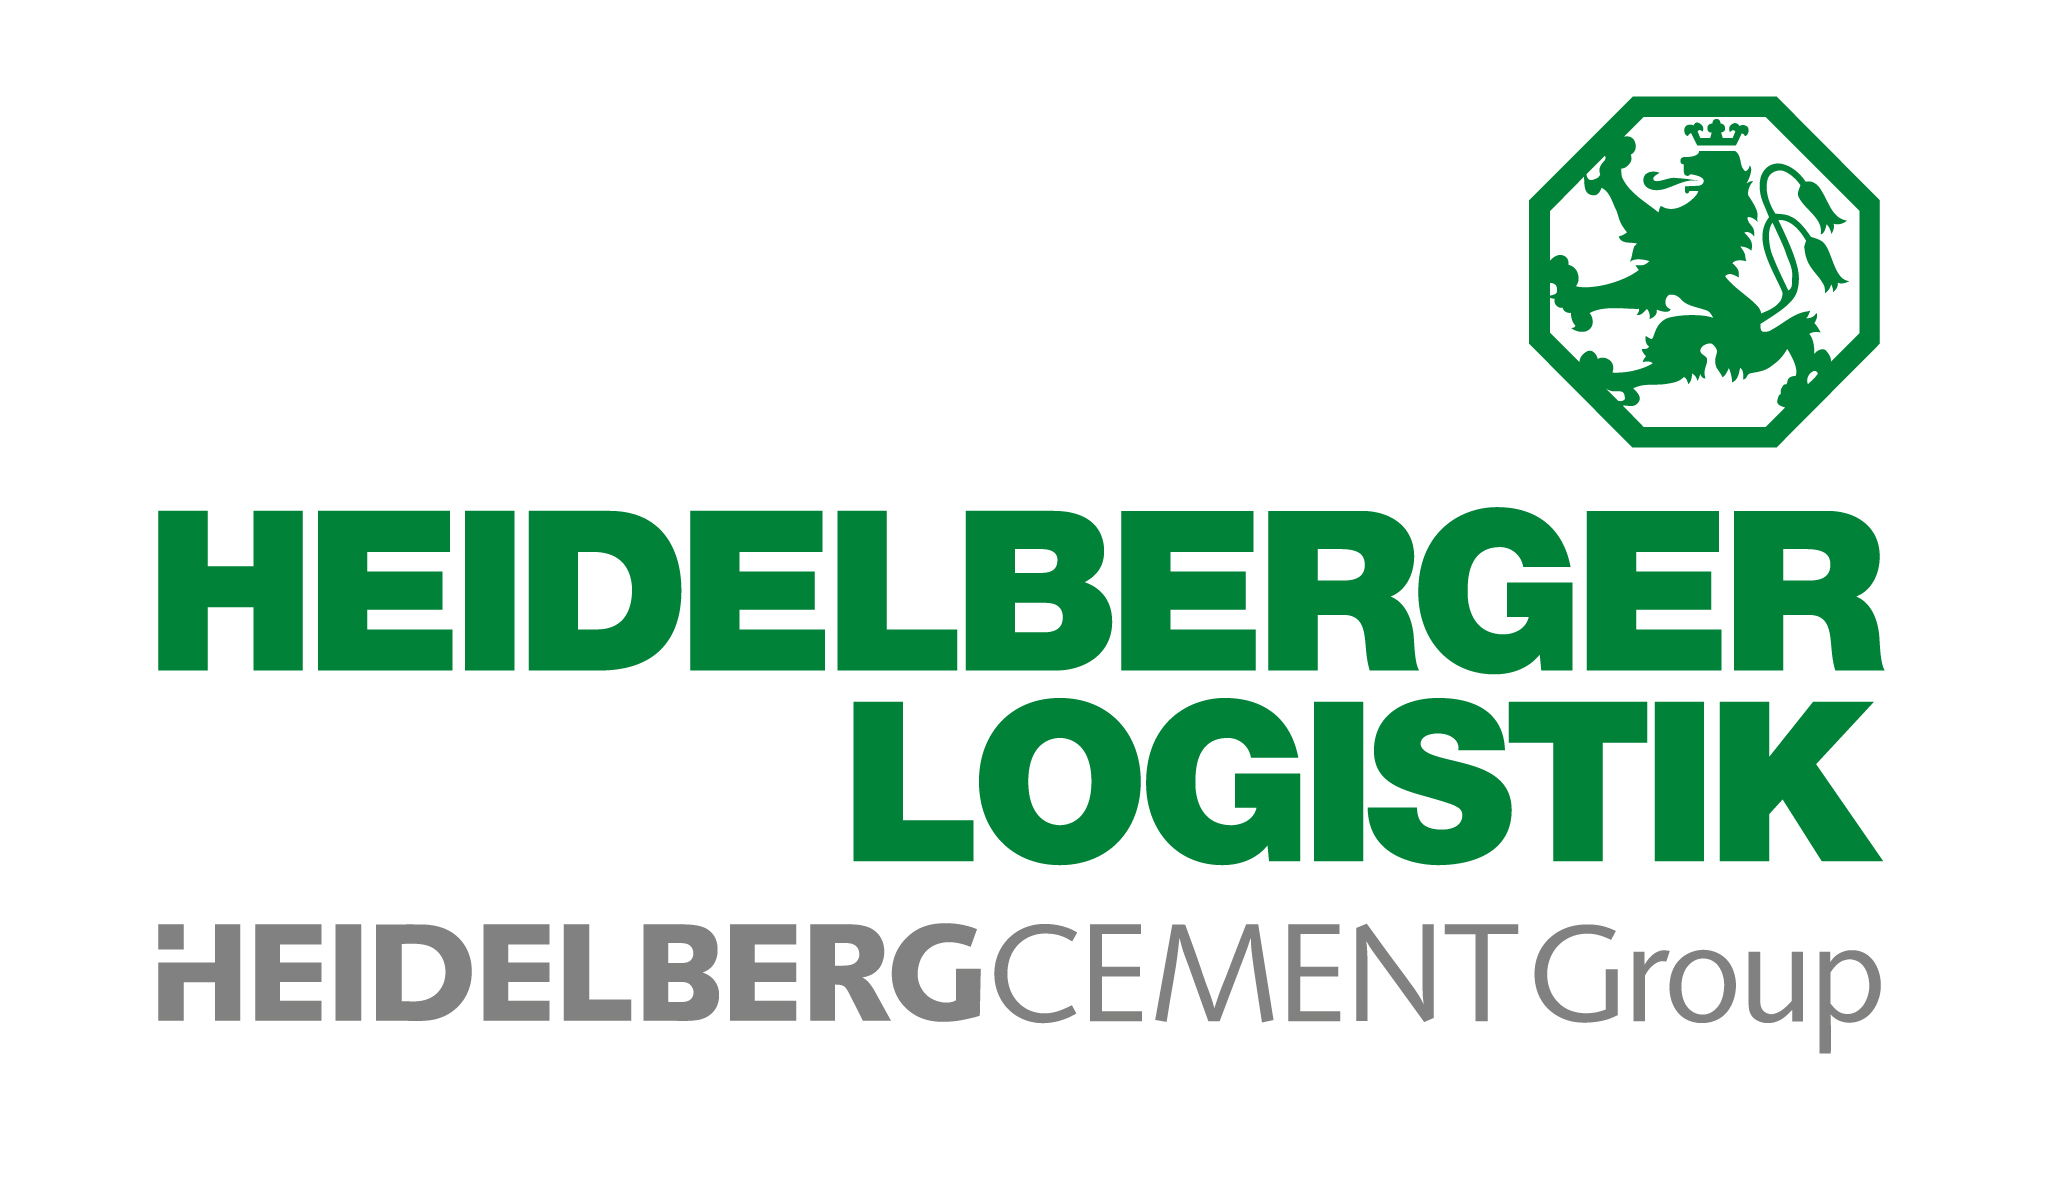 HeidelbergCement Logistik GmbH & Co. KG